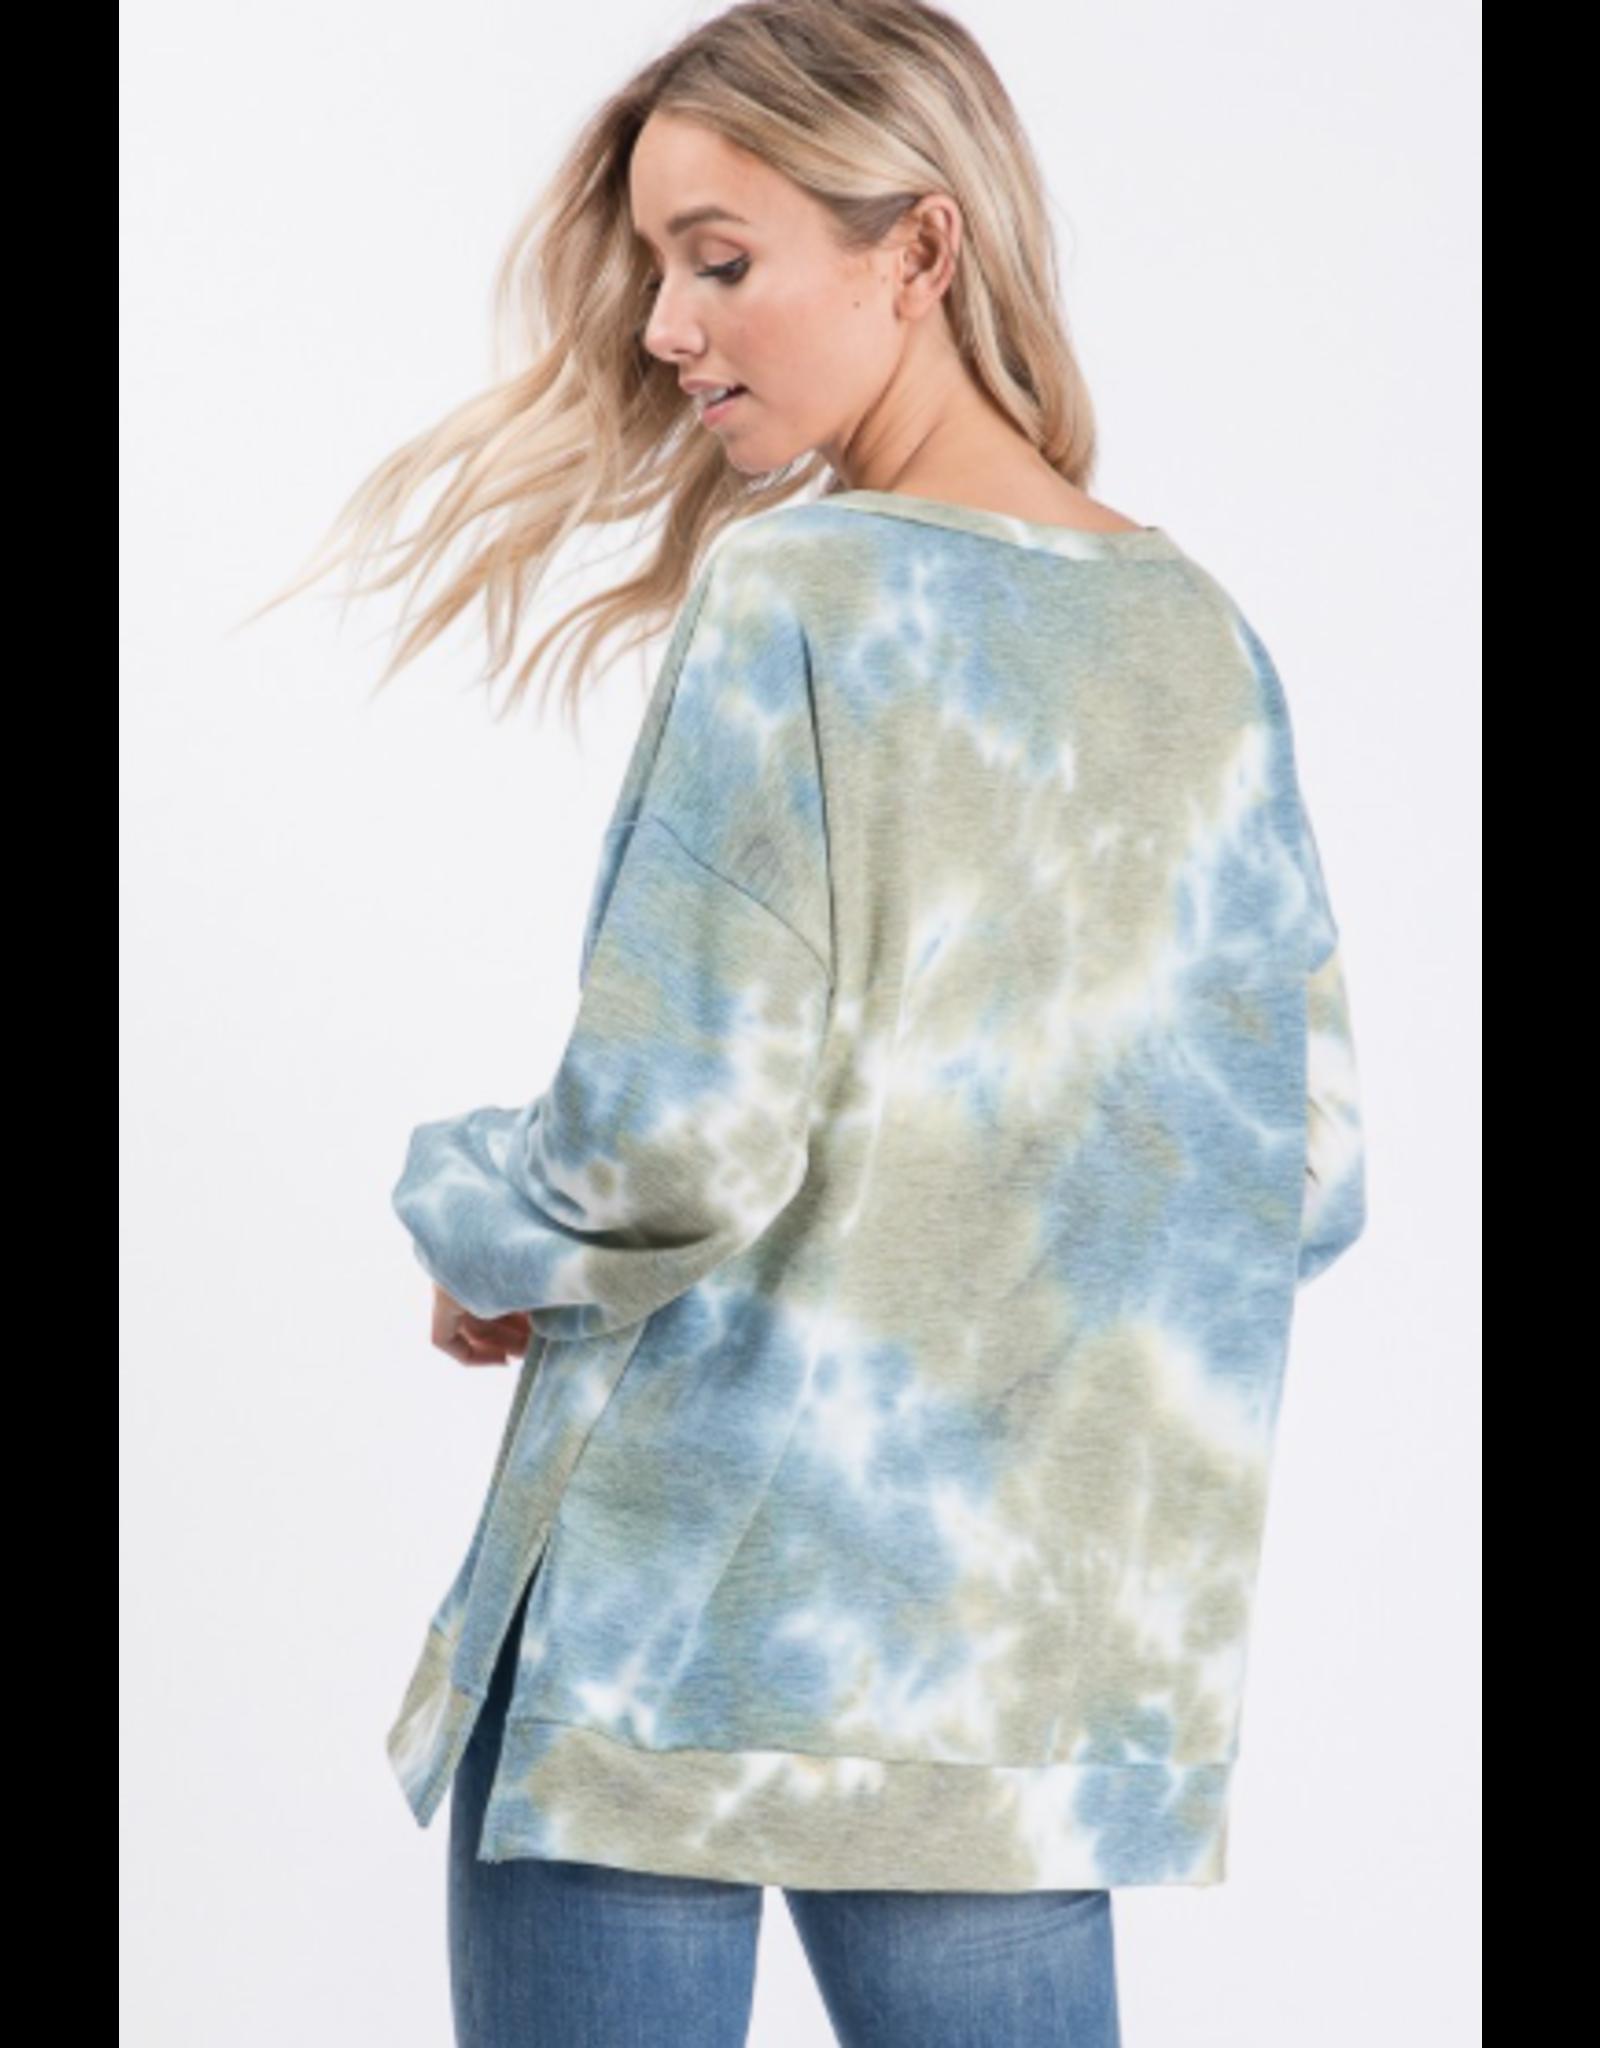 Orly - Tie dye long sleeve top